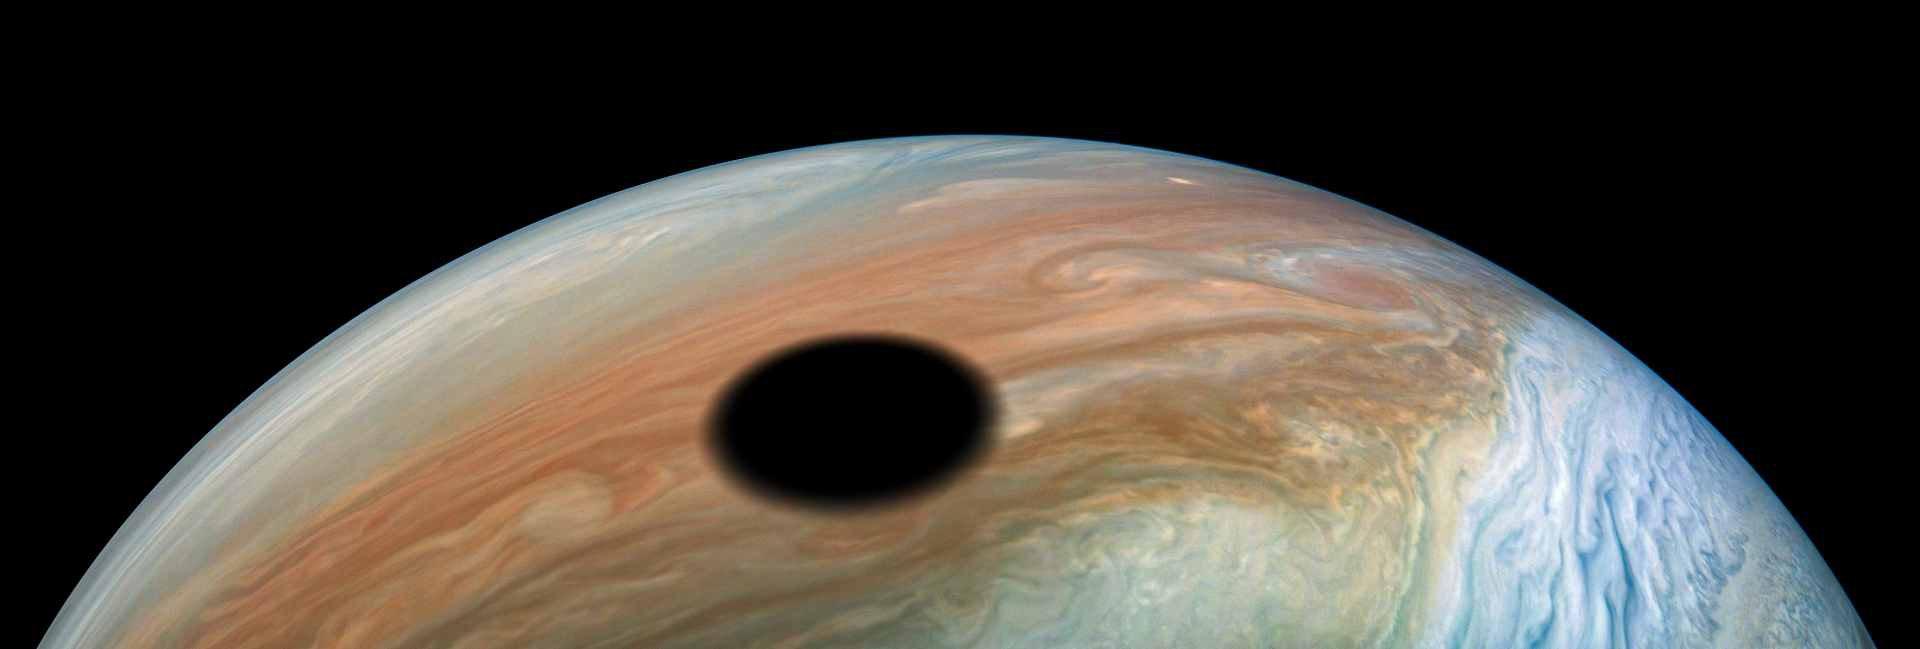 Gigantic black spot spotted on Jupiter by NASA spacecraft